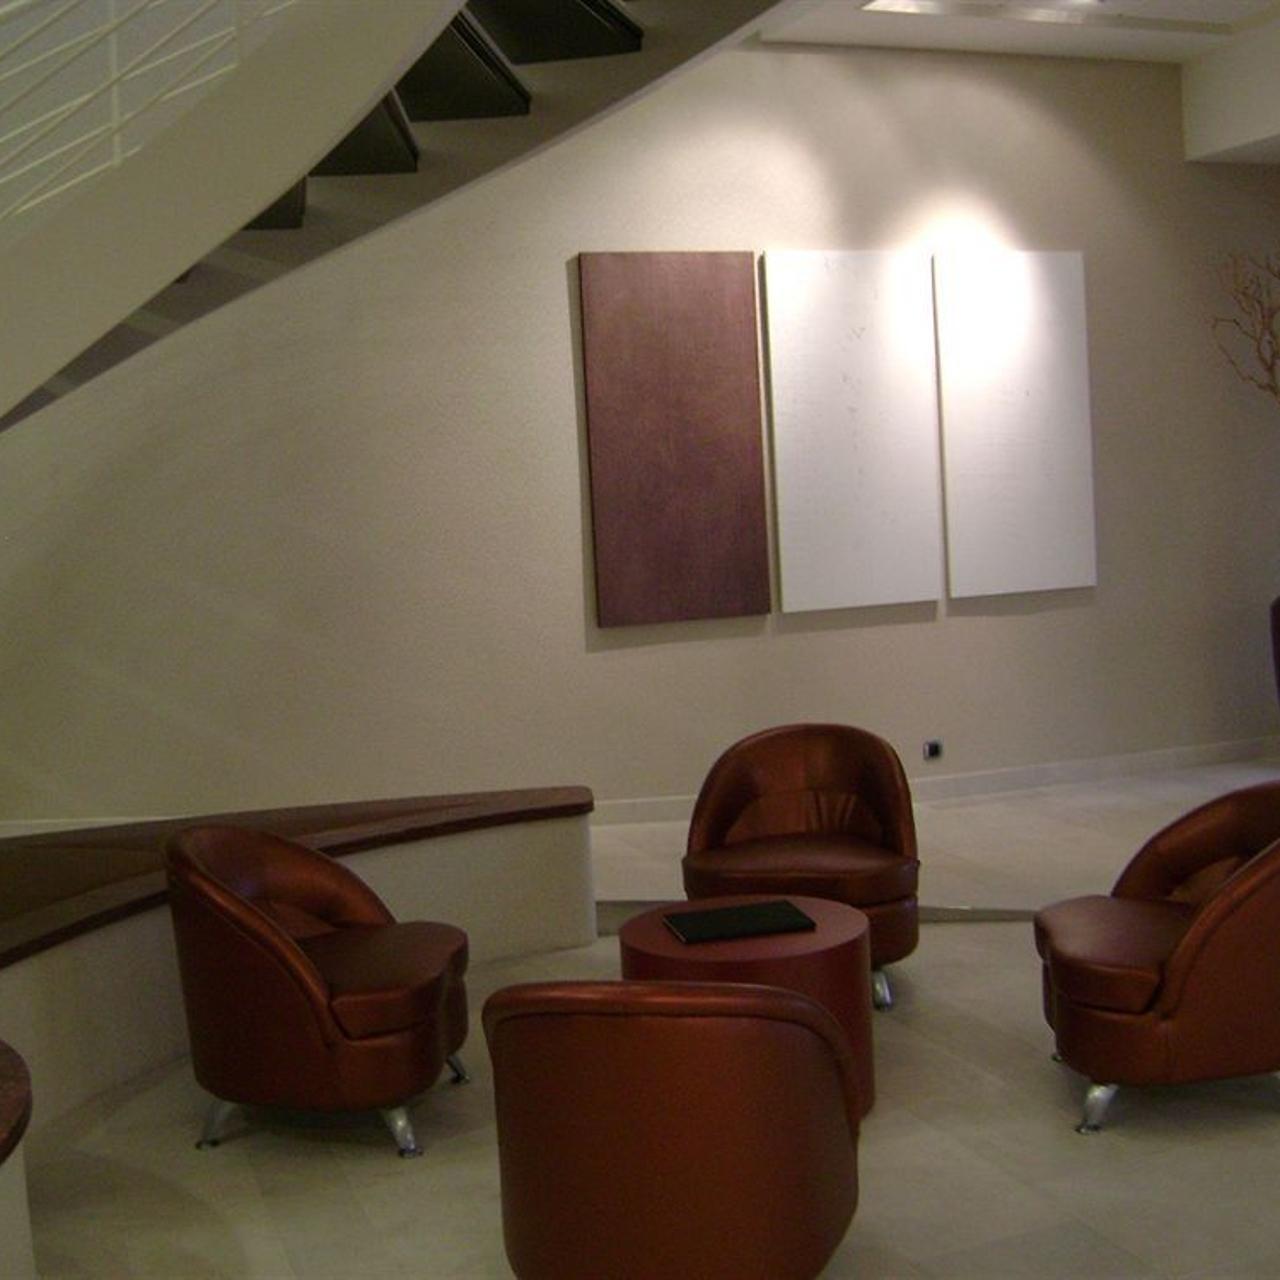 Hotel Spa Du Beryl 3 Hrs Star Hotel In Bagnoles De L Orne Lower